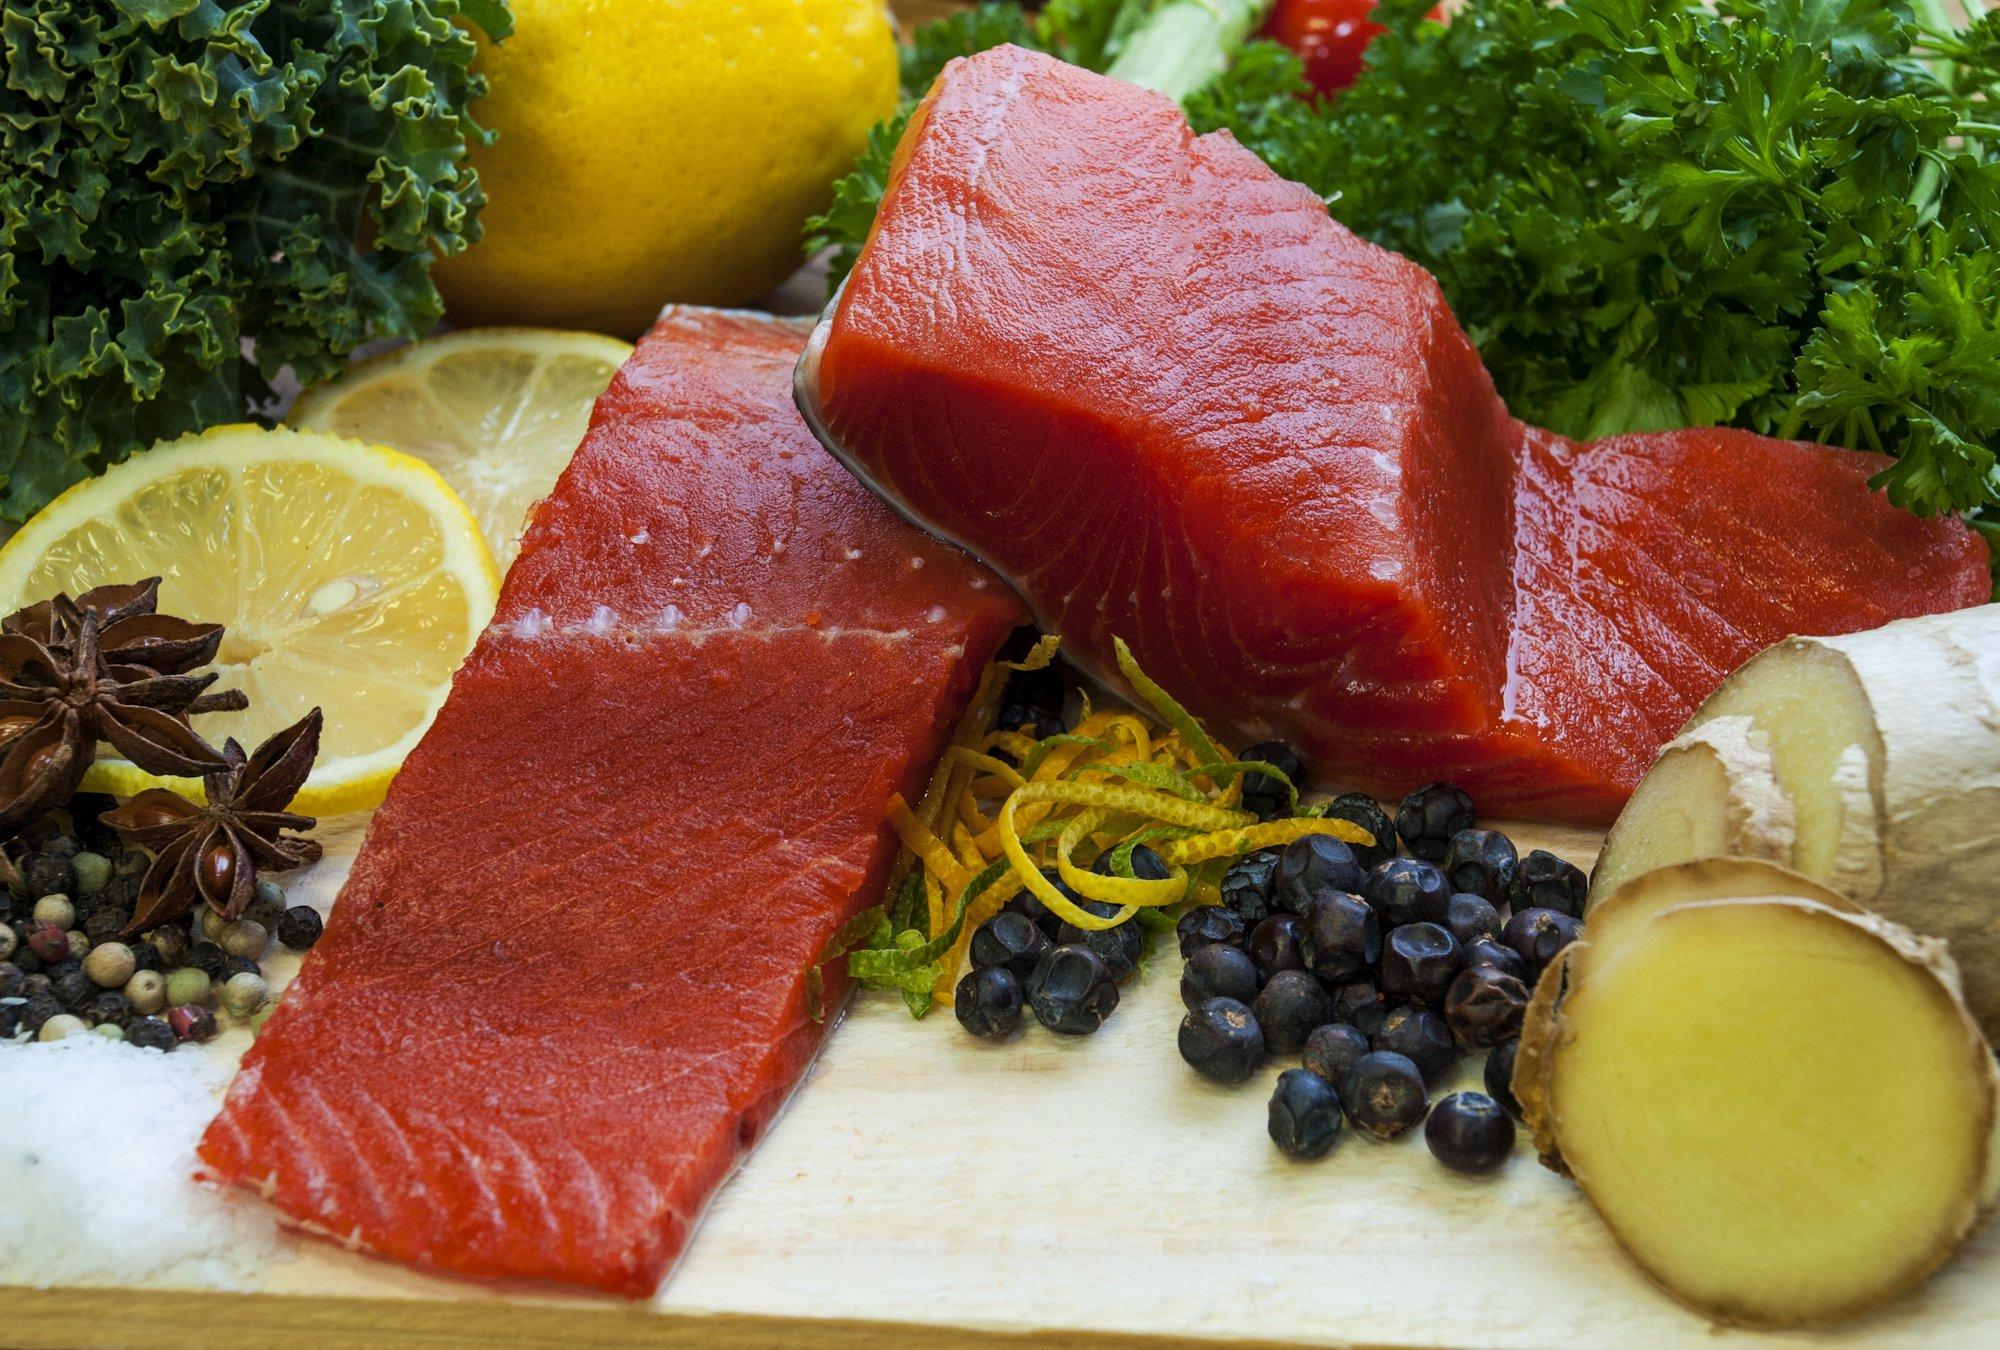 Sockeye Salmon Wild Caught - 10lbs. 20-30 Single Serving Portions